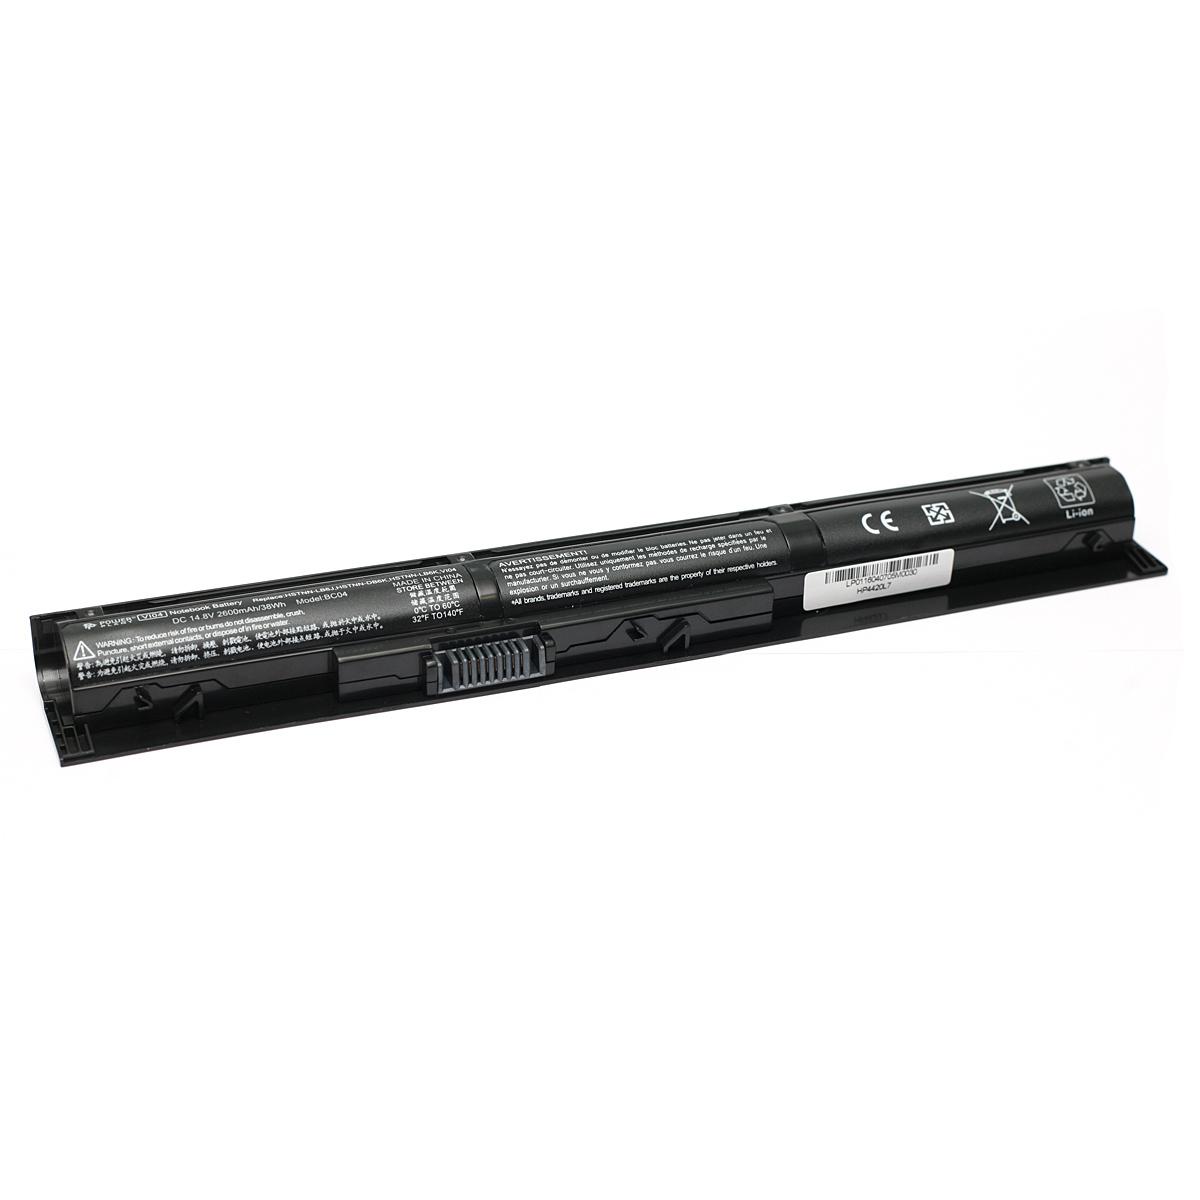 Купить Аккумулятор PowerPlant для ноутбуков HP ProBook 440 G2 (HSTNN-LB6J, HP4420L7) 14.8V 2600mAh